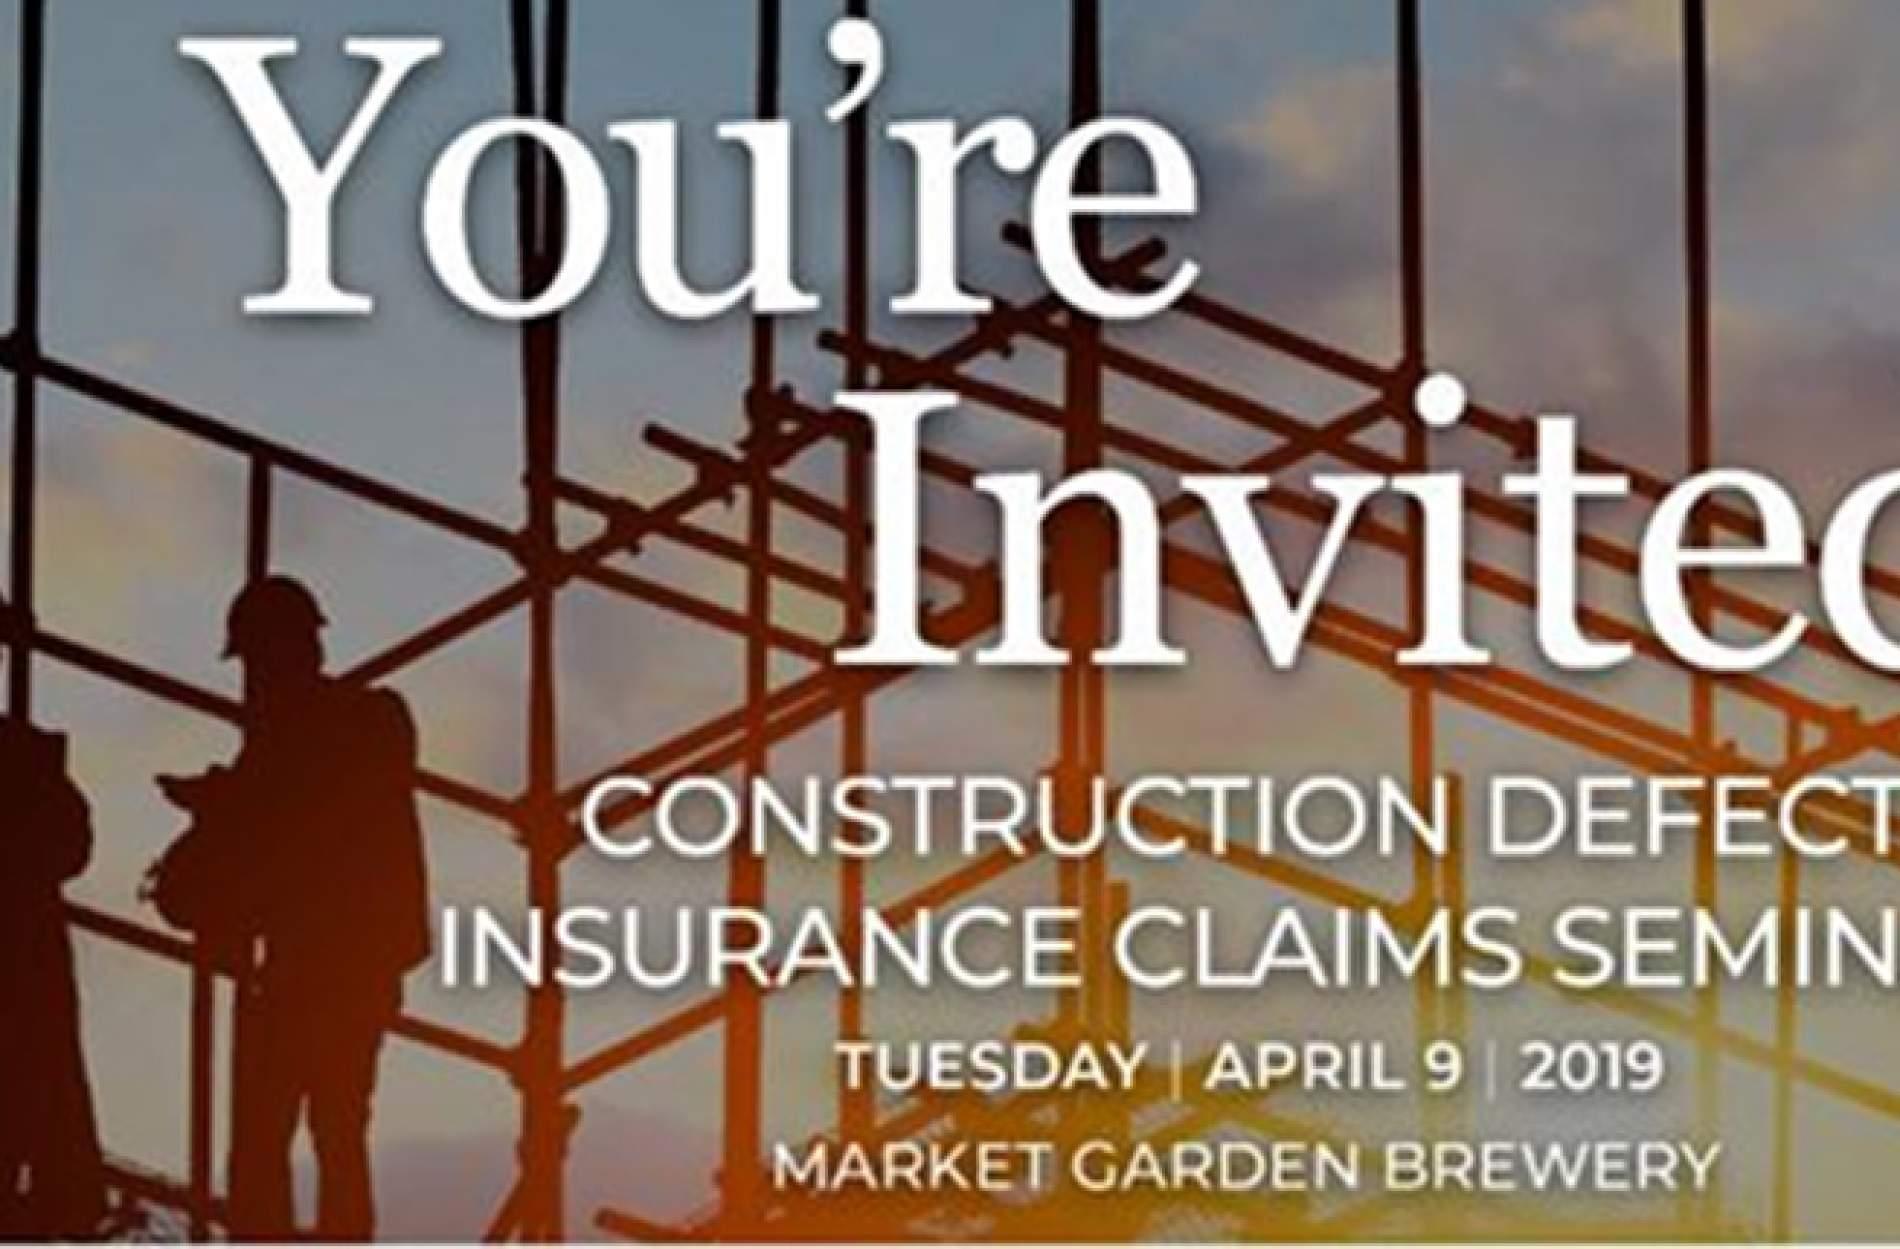 Construction Defect Insurance Claims: April 9 Seminar